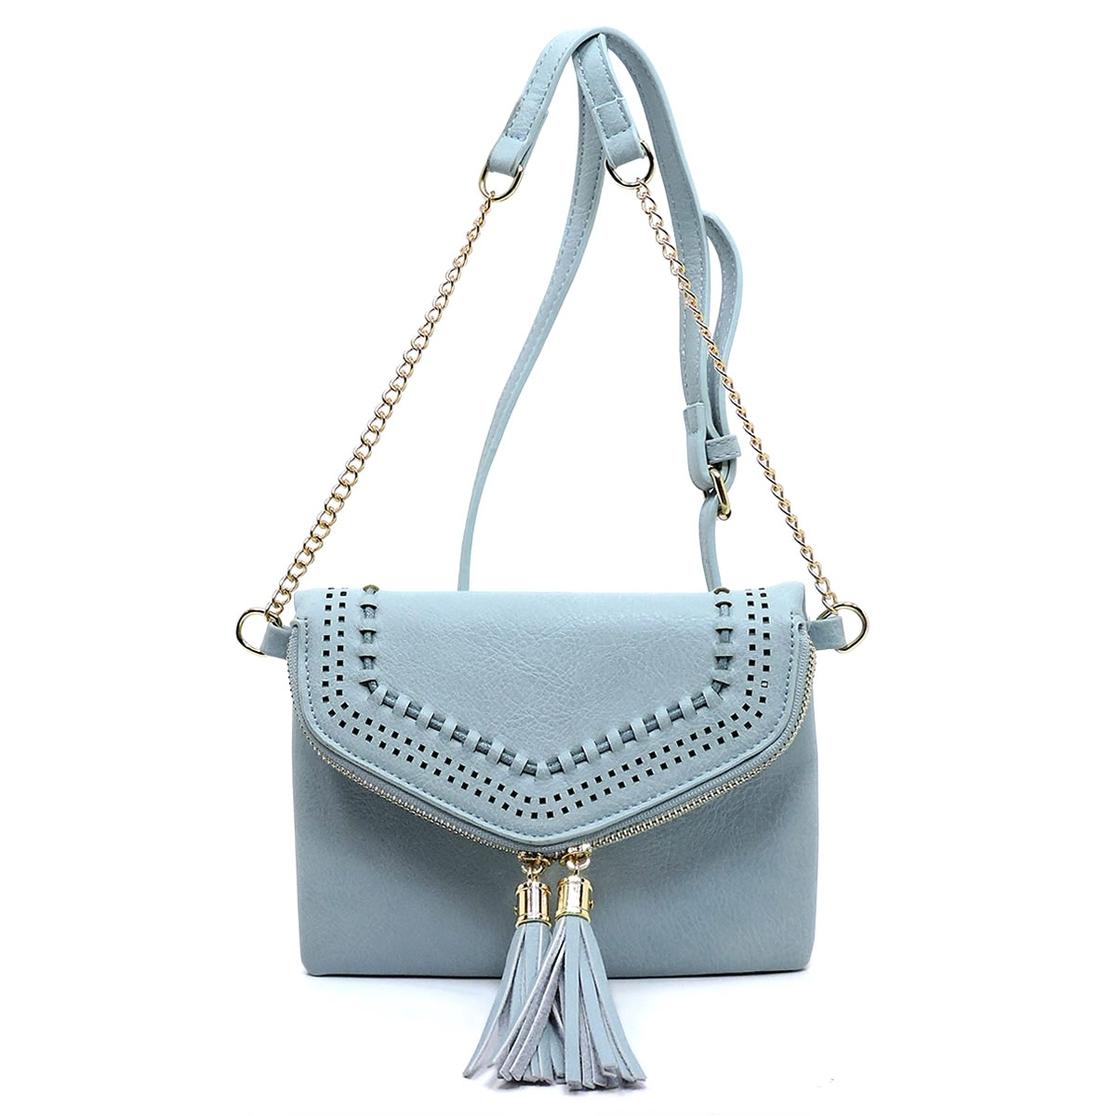 e85fbb41fd FASHION BRIDGE Wholesale Tassel Zip Envelope Crossbody Bag ...